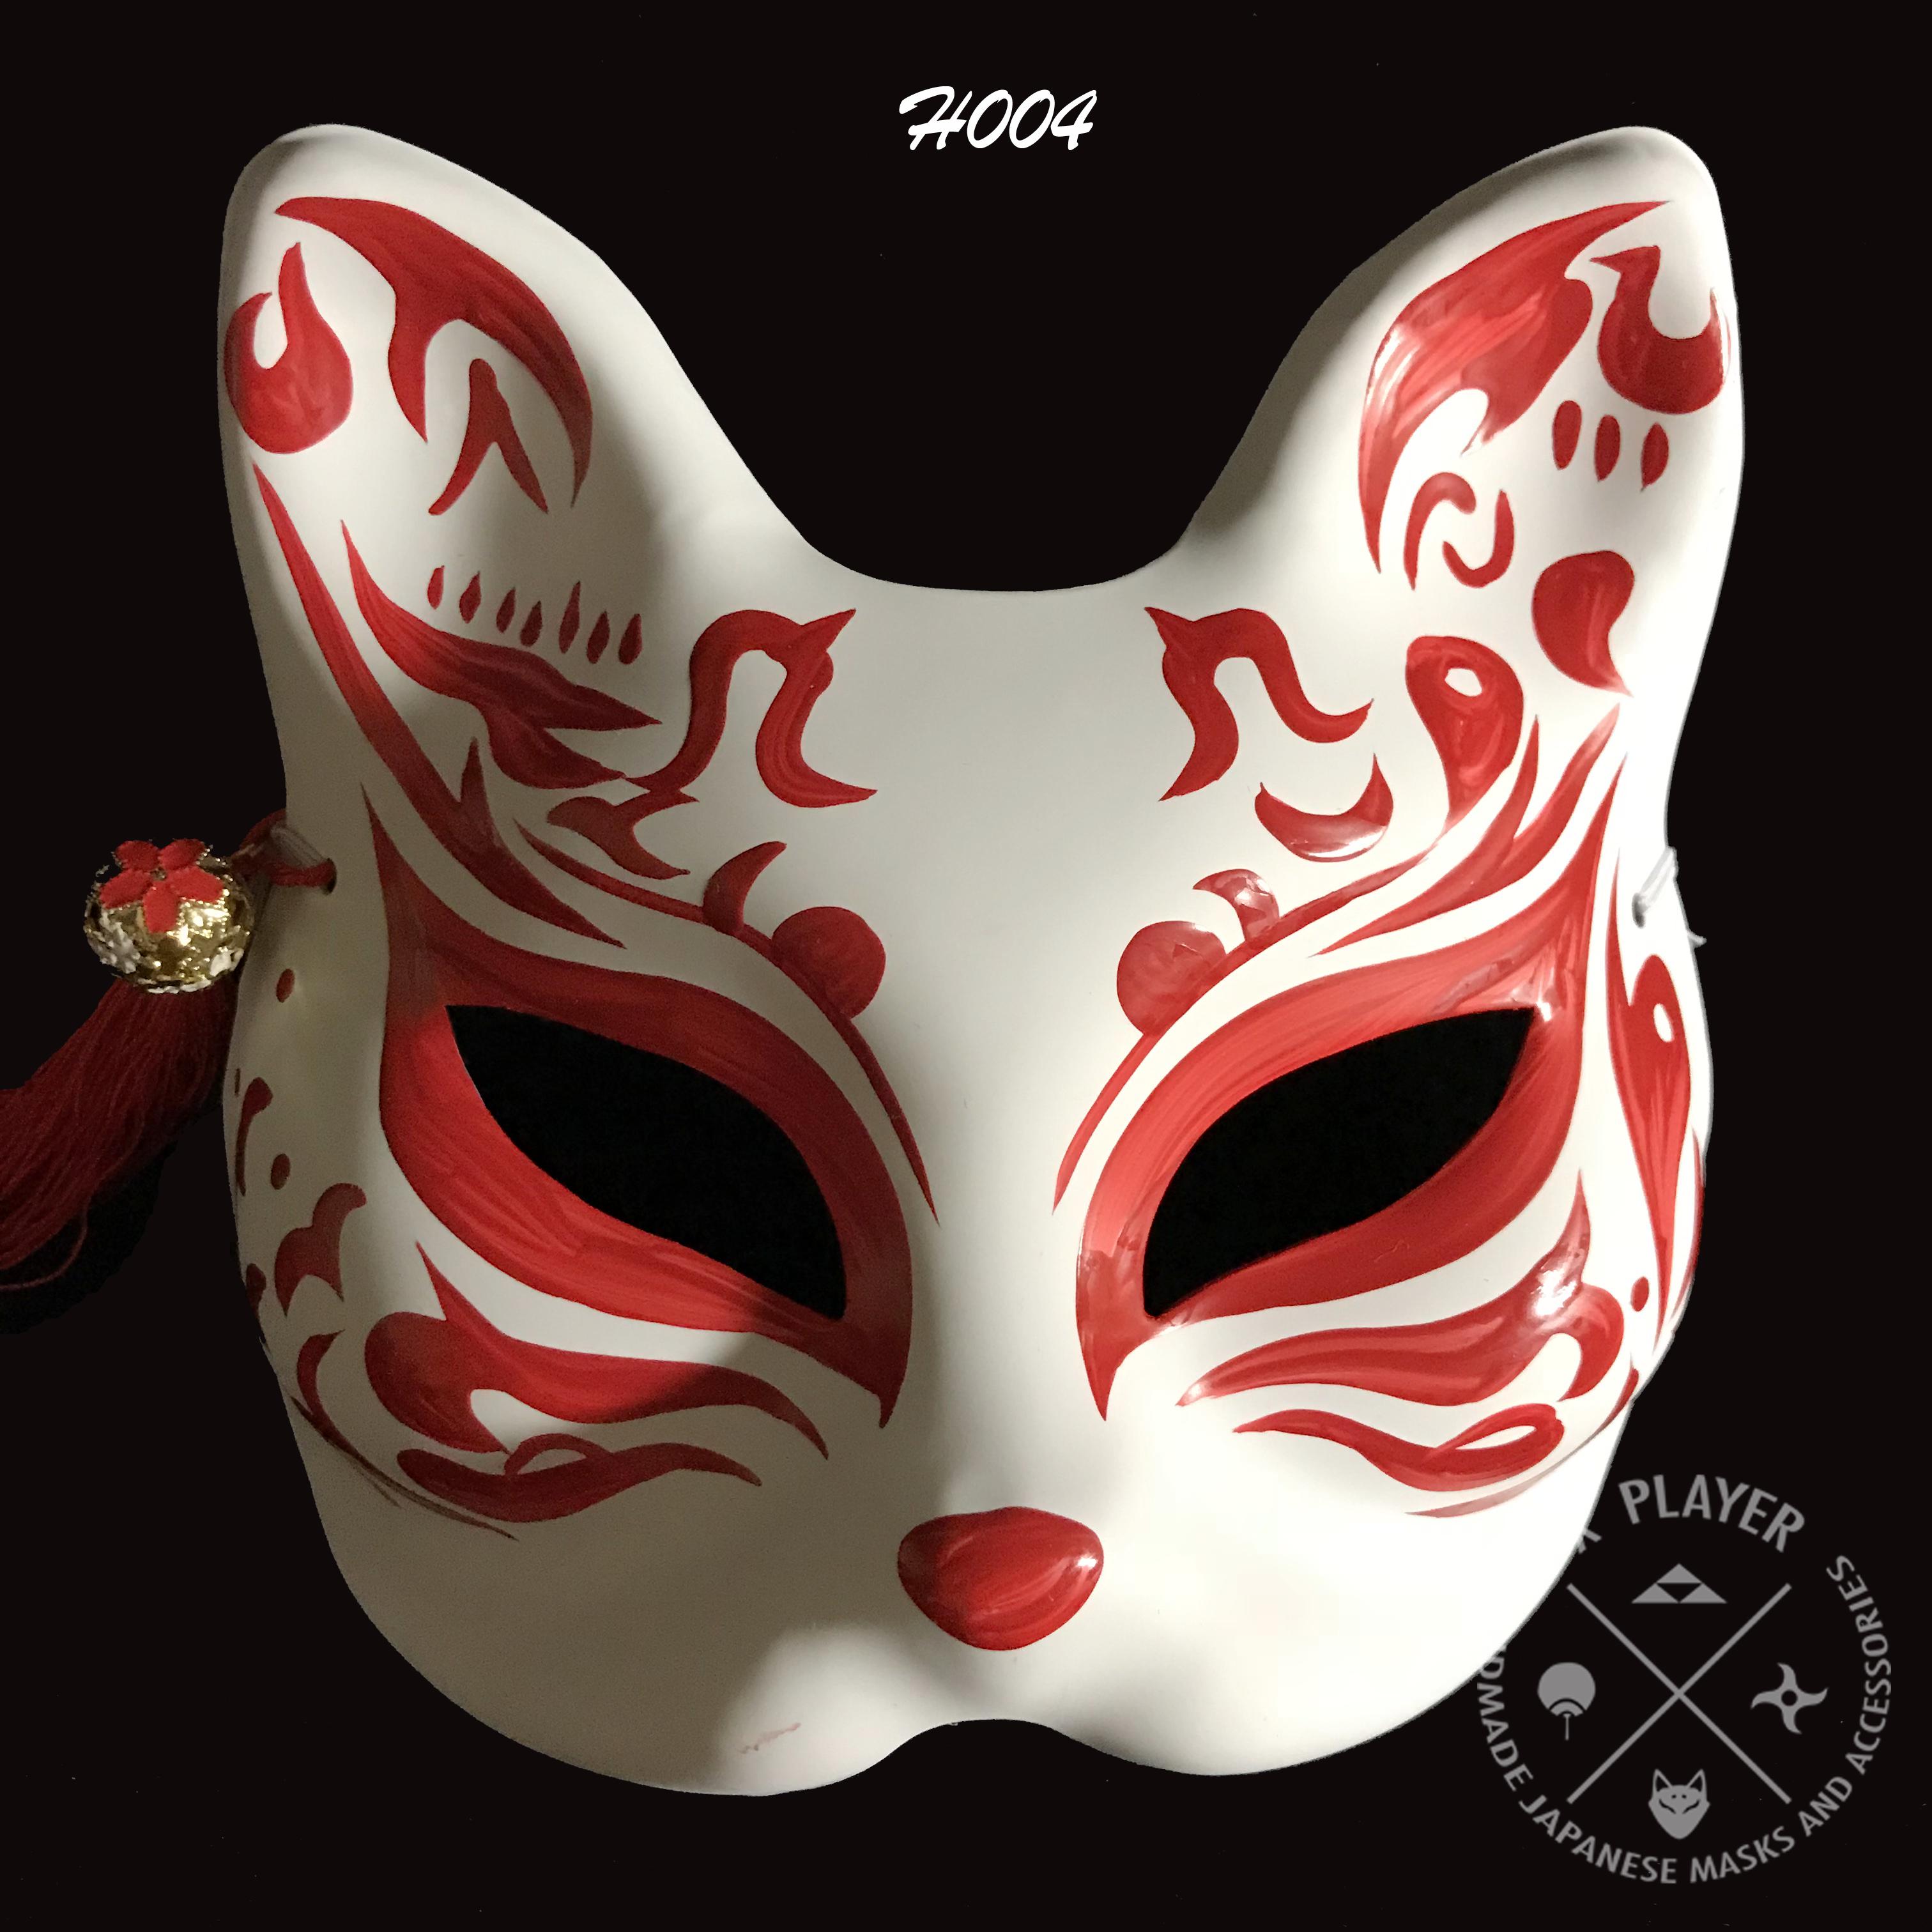 Half Face Kitsune Mask The Evil Kitsune Mask Kitsune Japanese Fox Mask